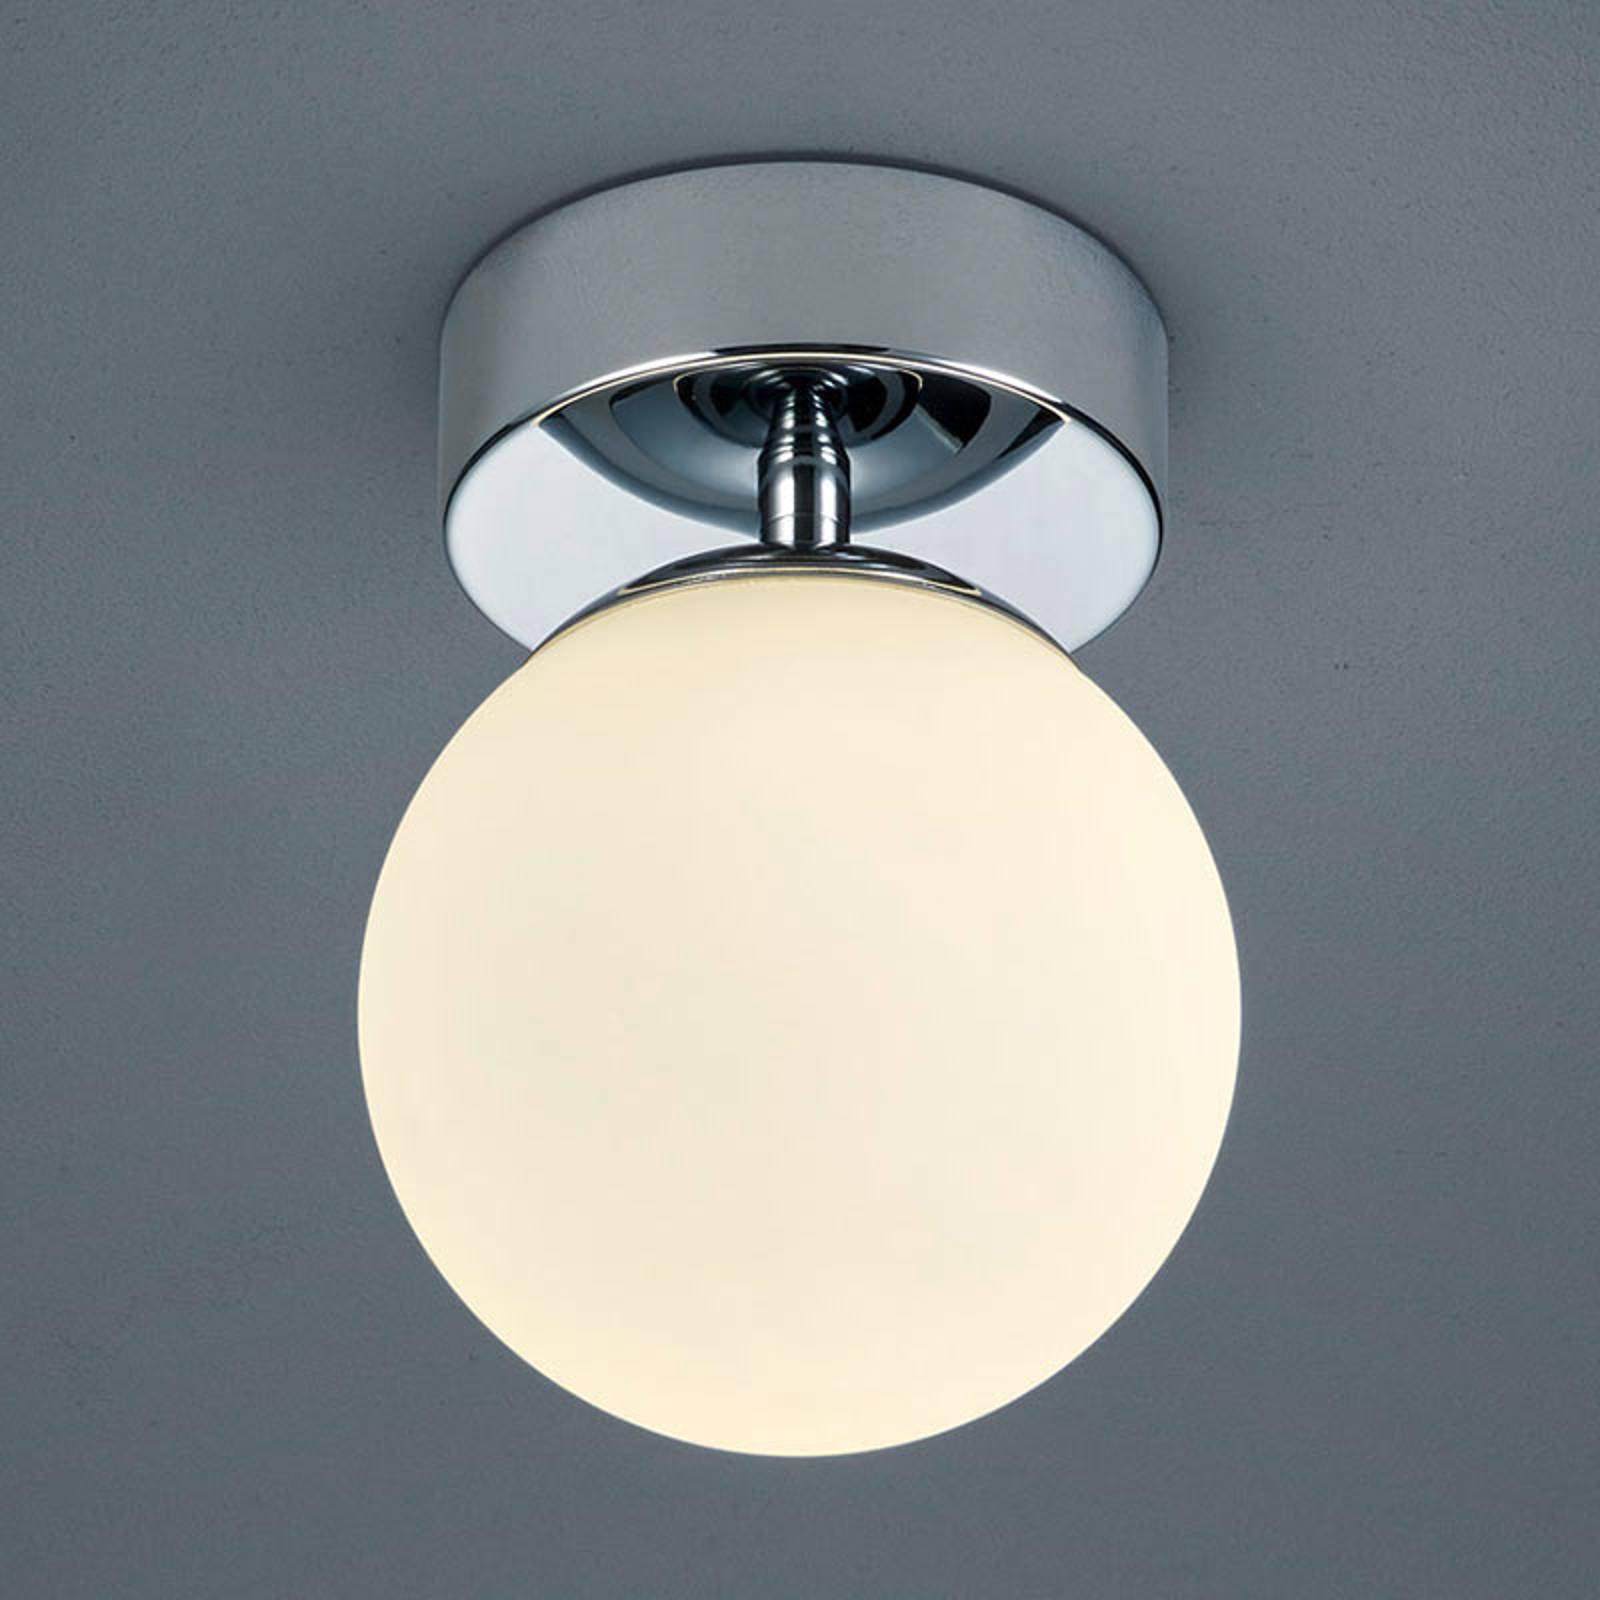 Helestra Keto - LED-taklampe til bad, kule